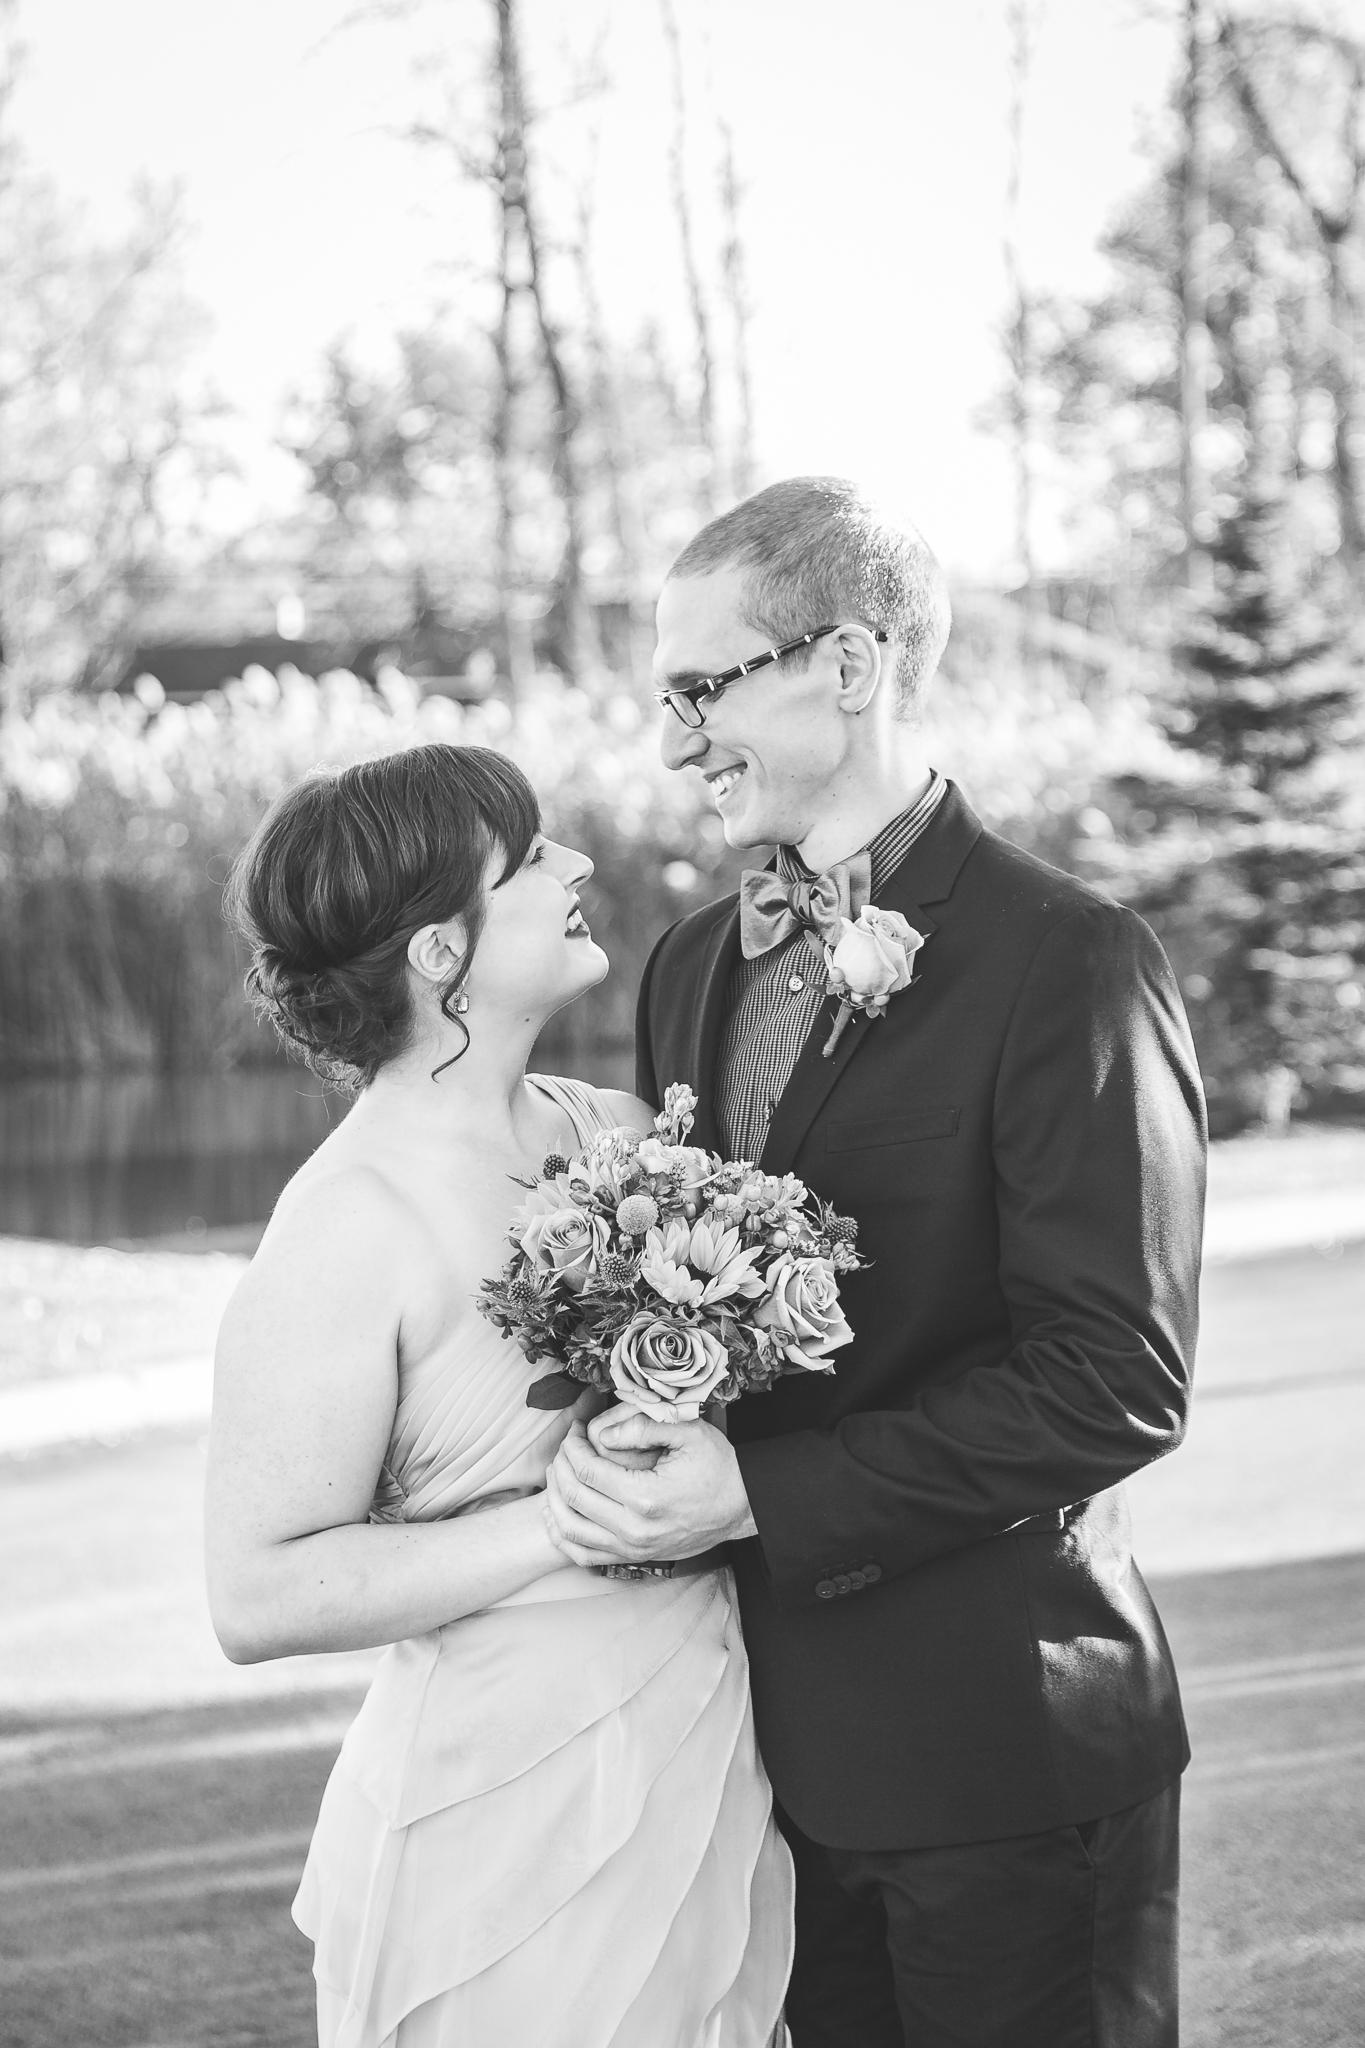 camuglia-whomstudio-chelsea_and_andy-nycphotographer-wedding-brooklyn-buffalo-timberlodge-028-5304.jpg